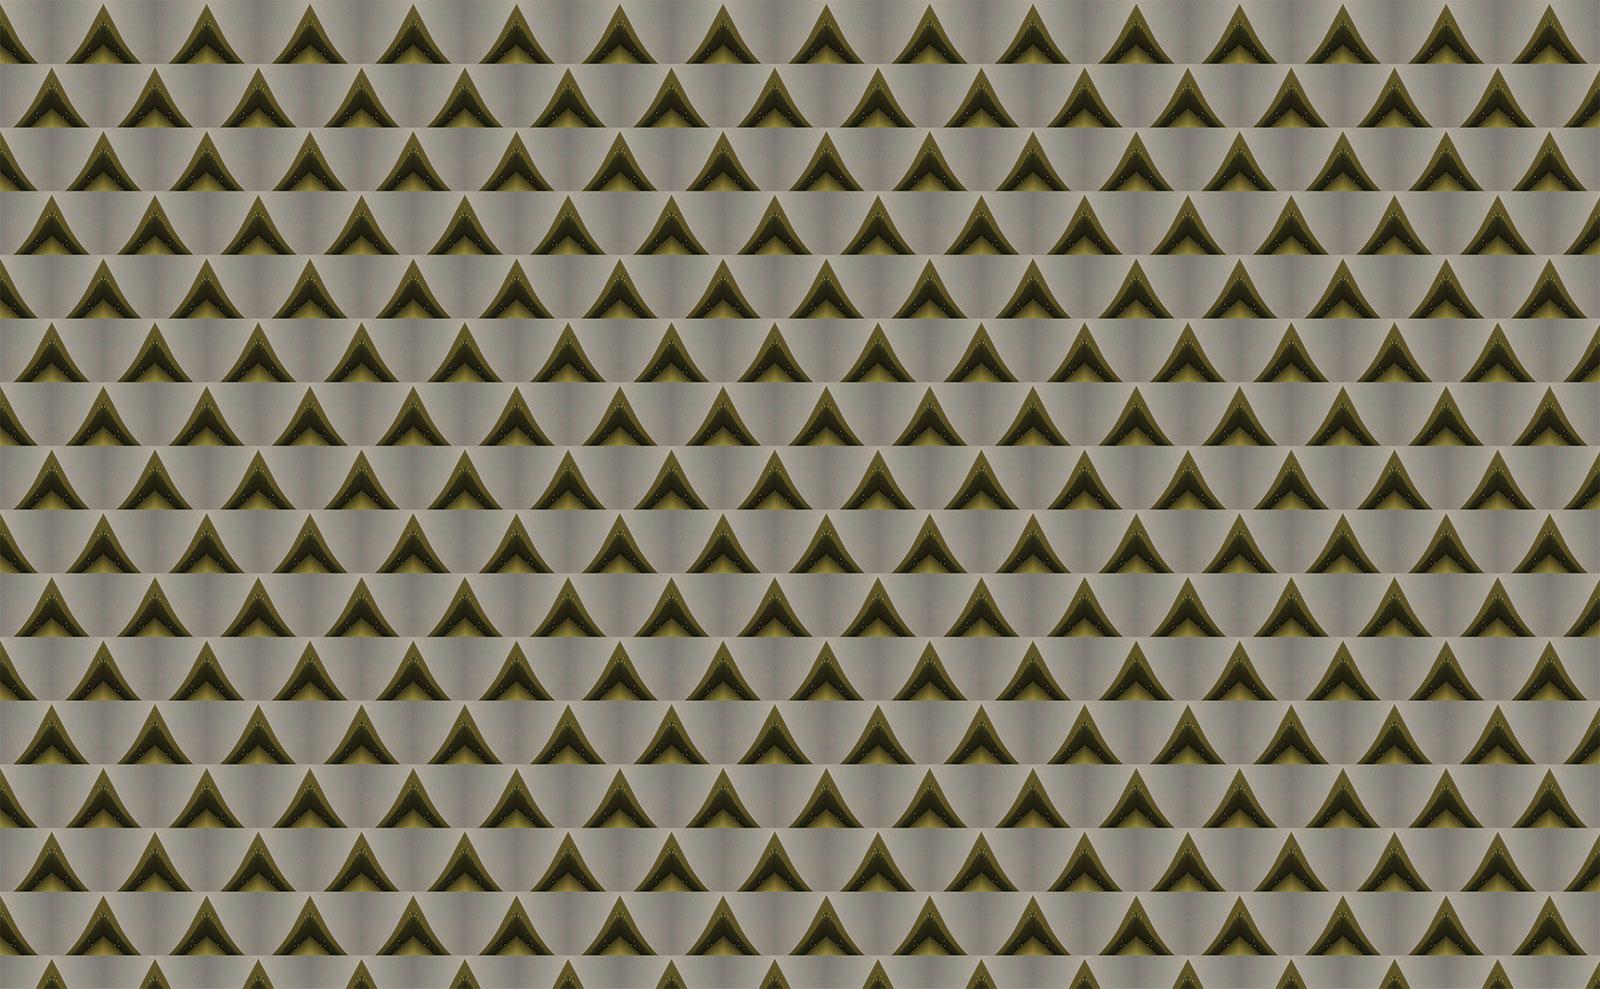 ∞-∞-≈-≈----§o--∑.jpg